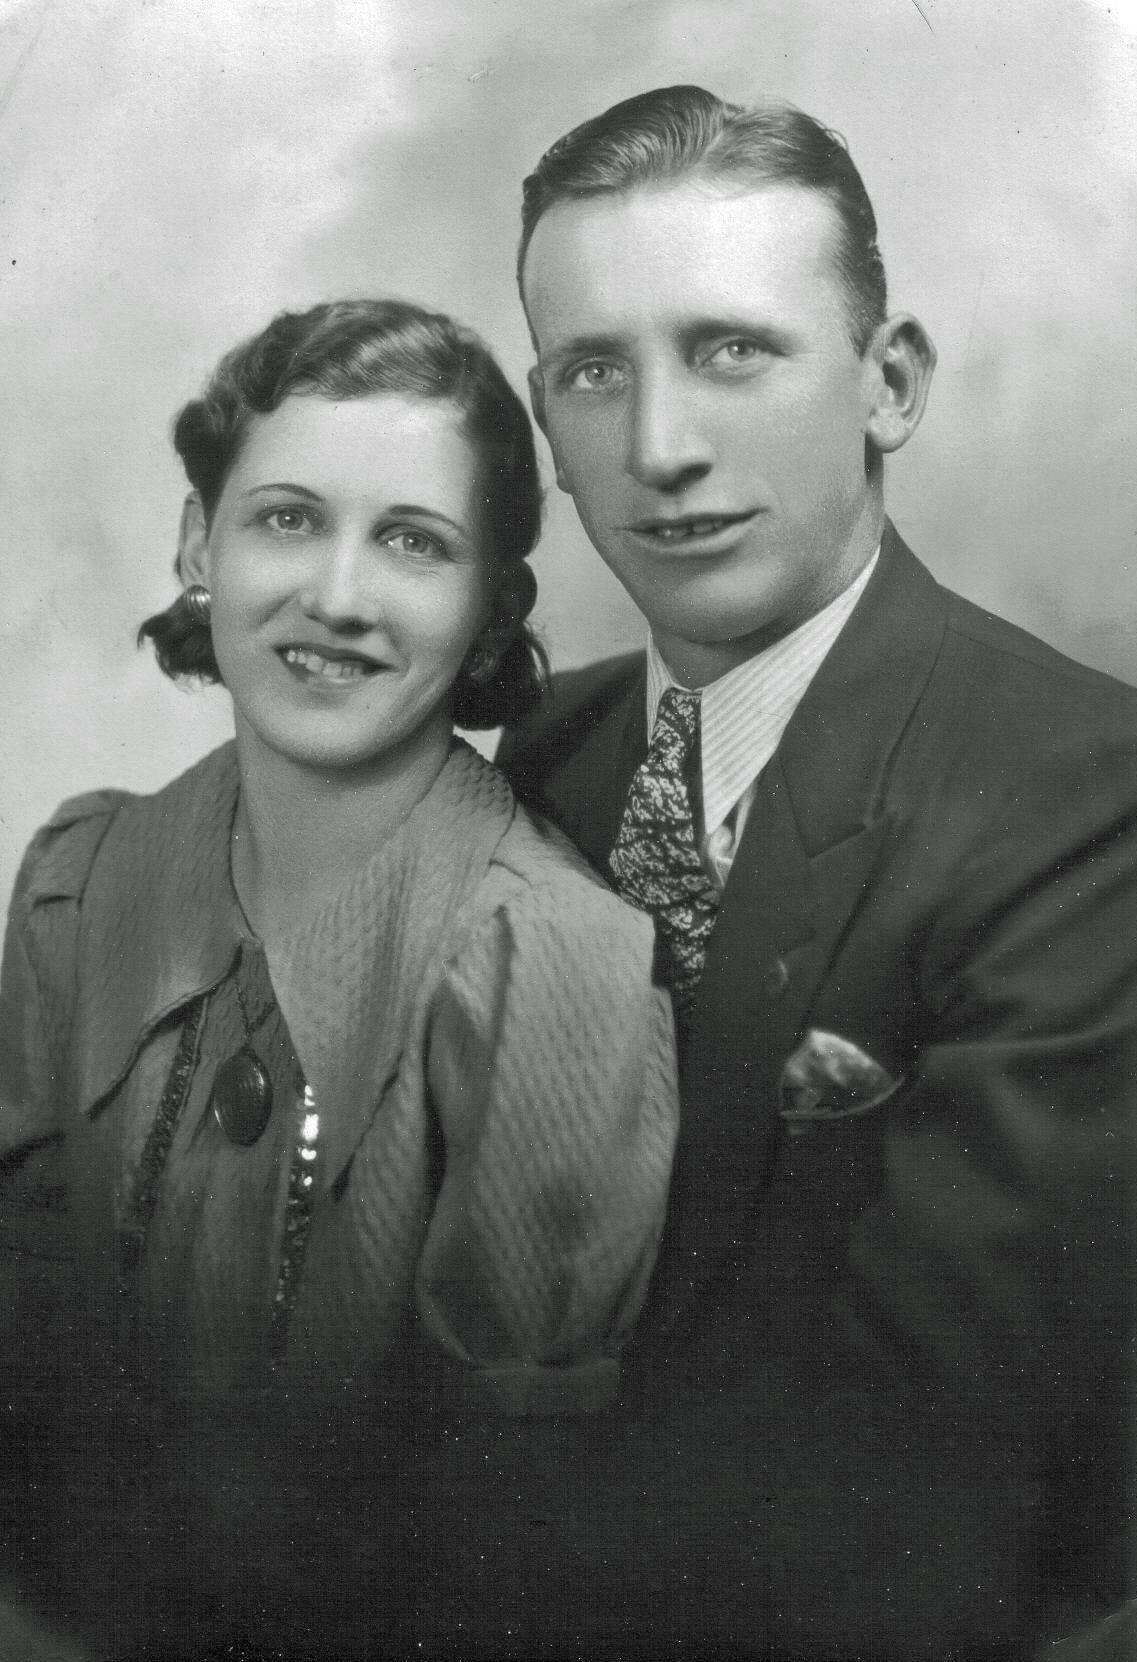 REECE Elmer and SIMPSON Marjorie Wedding photo